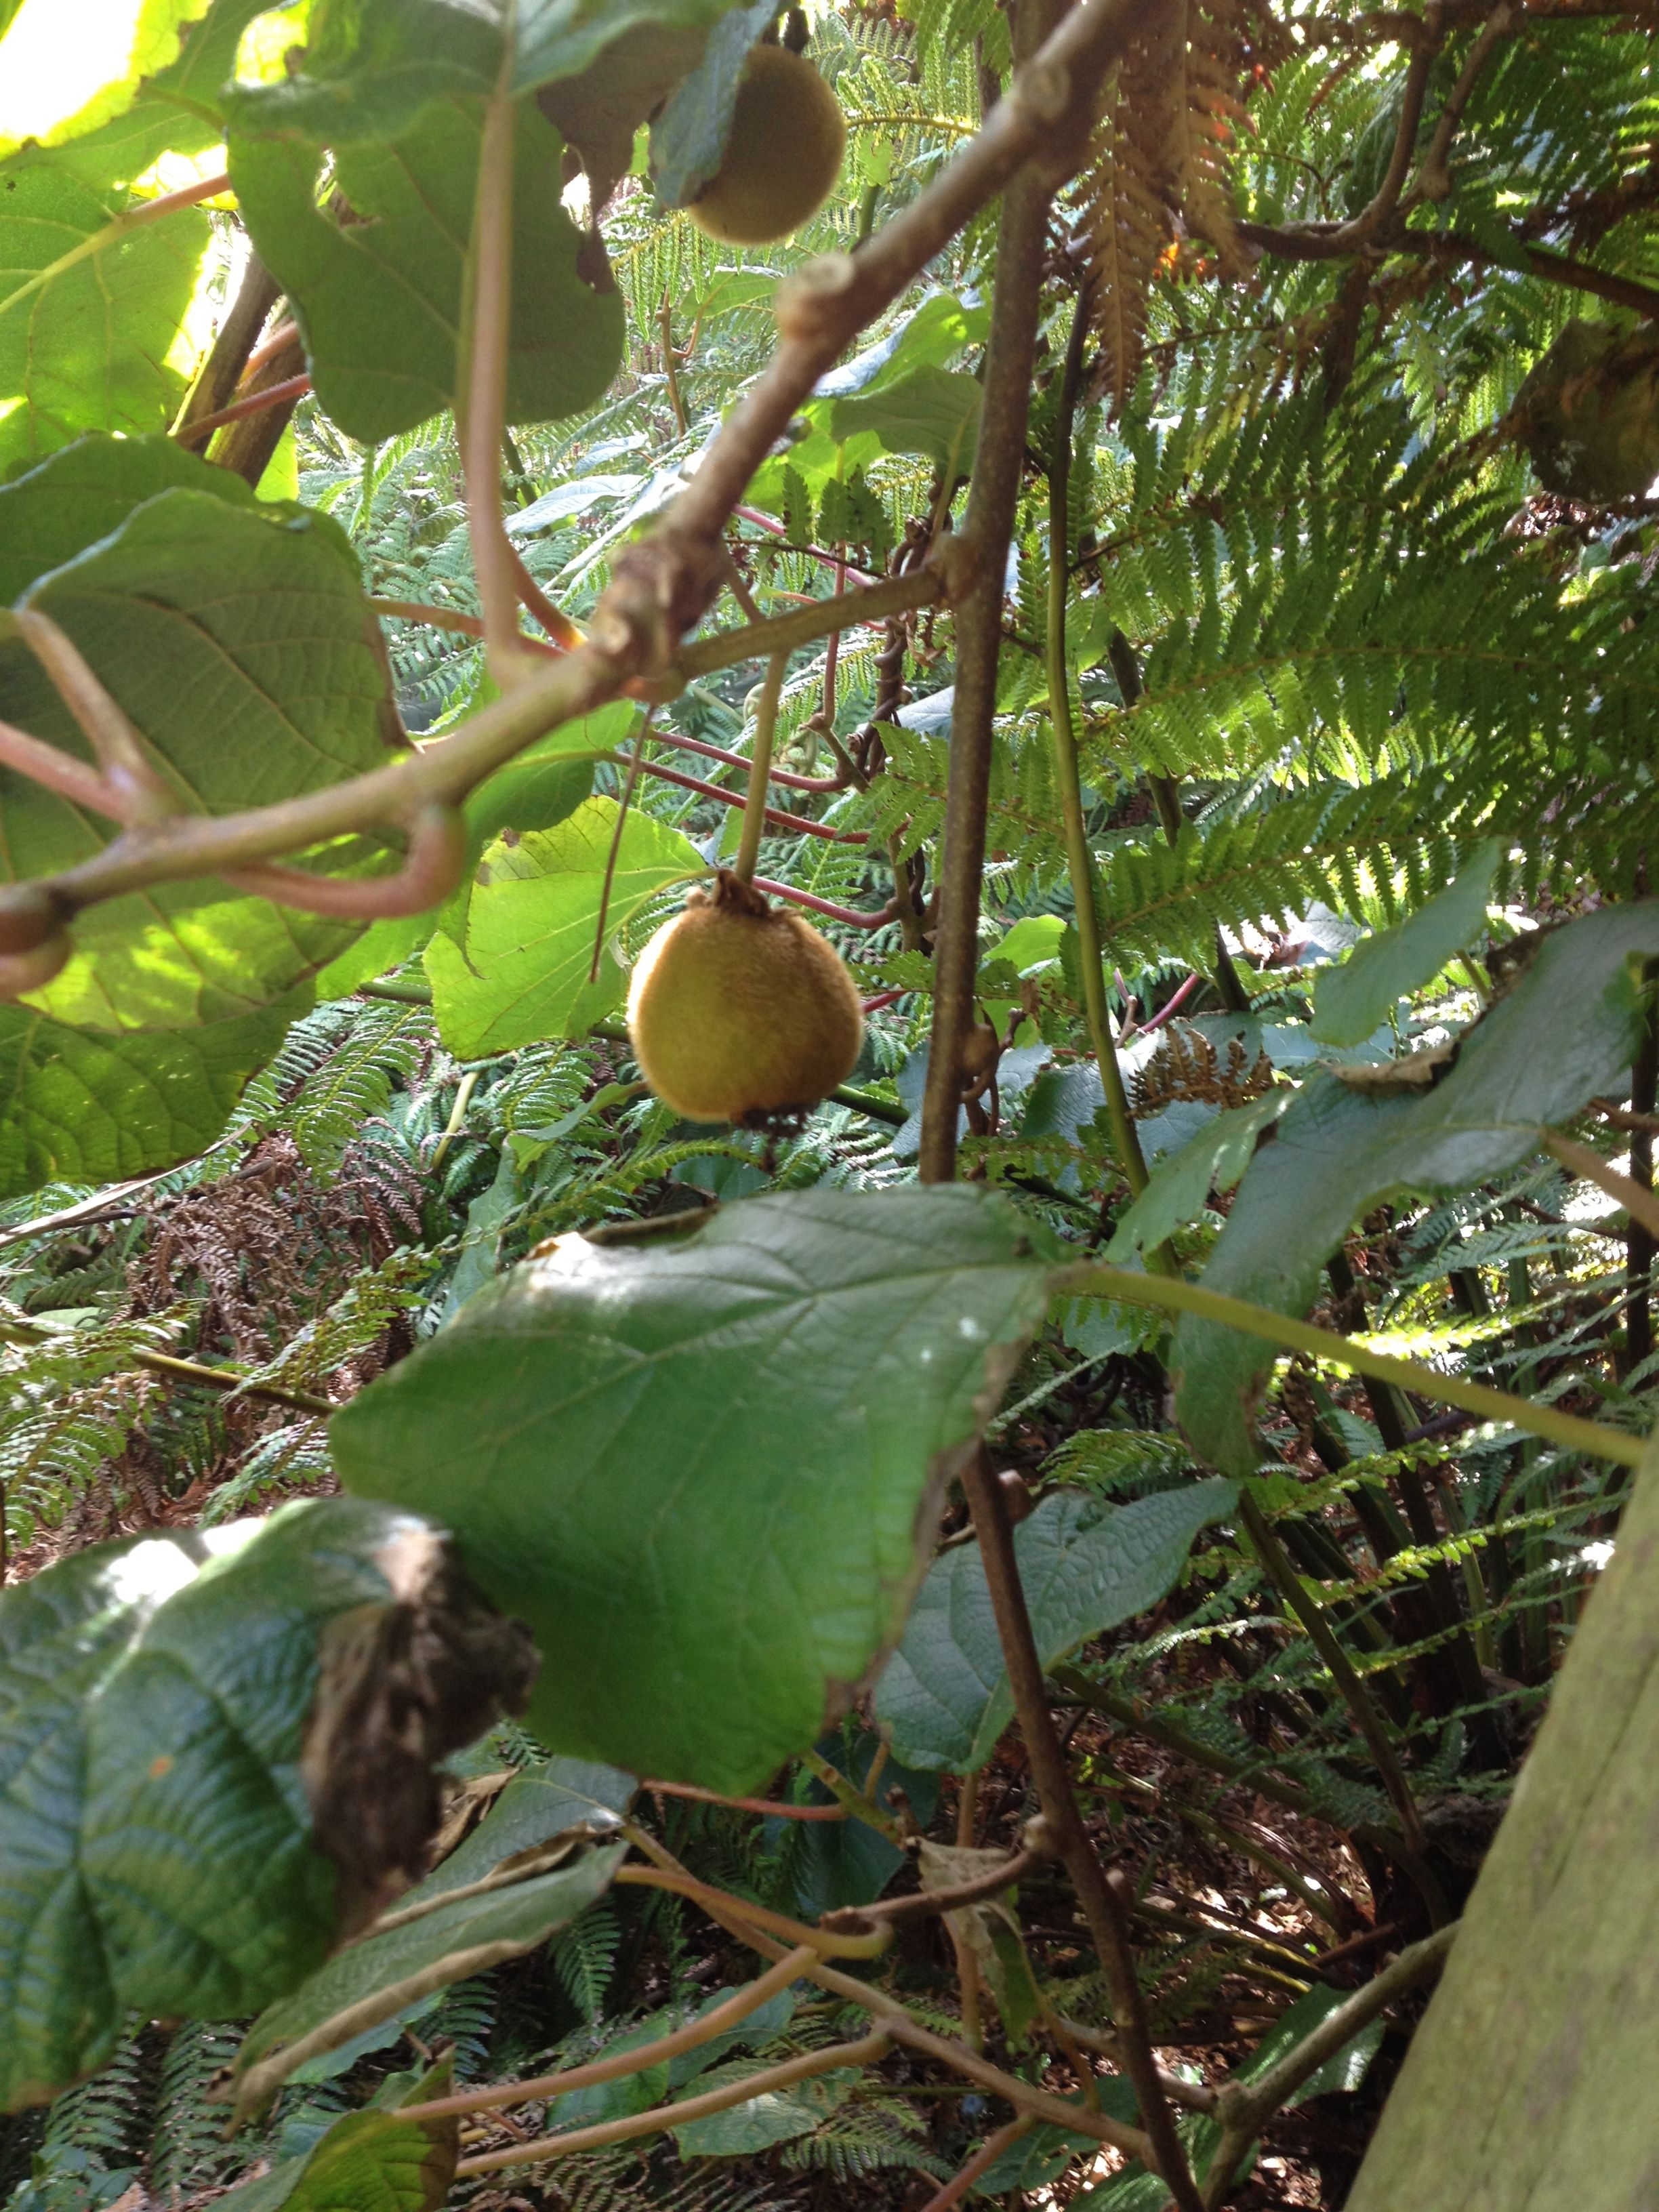 Kiwi Fruit Treevine Growing In A Park